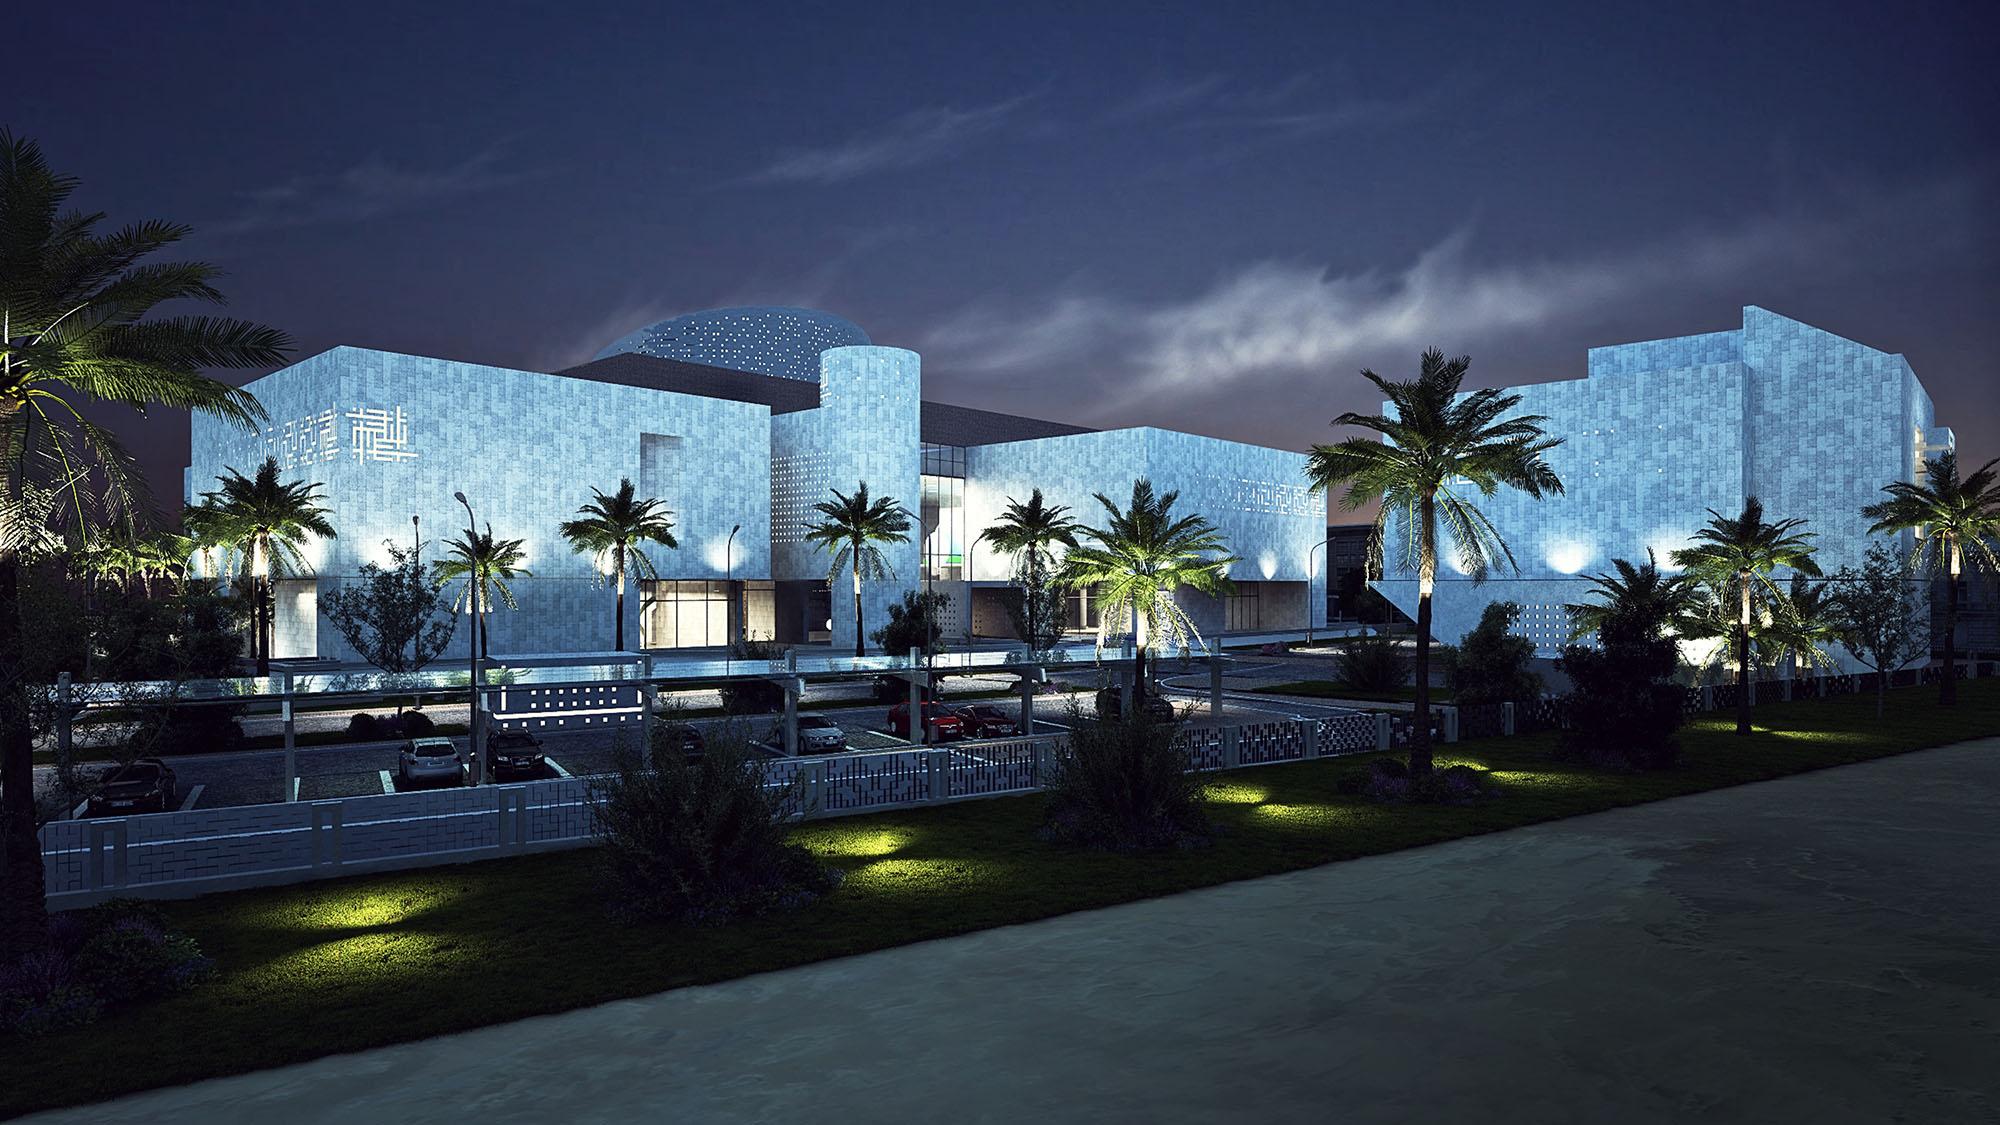 The Al-Seera And Al-Hadeeth Al-Shareef Centre